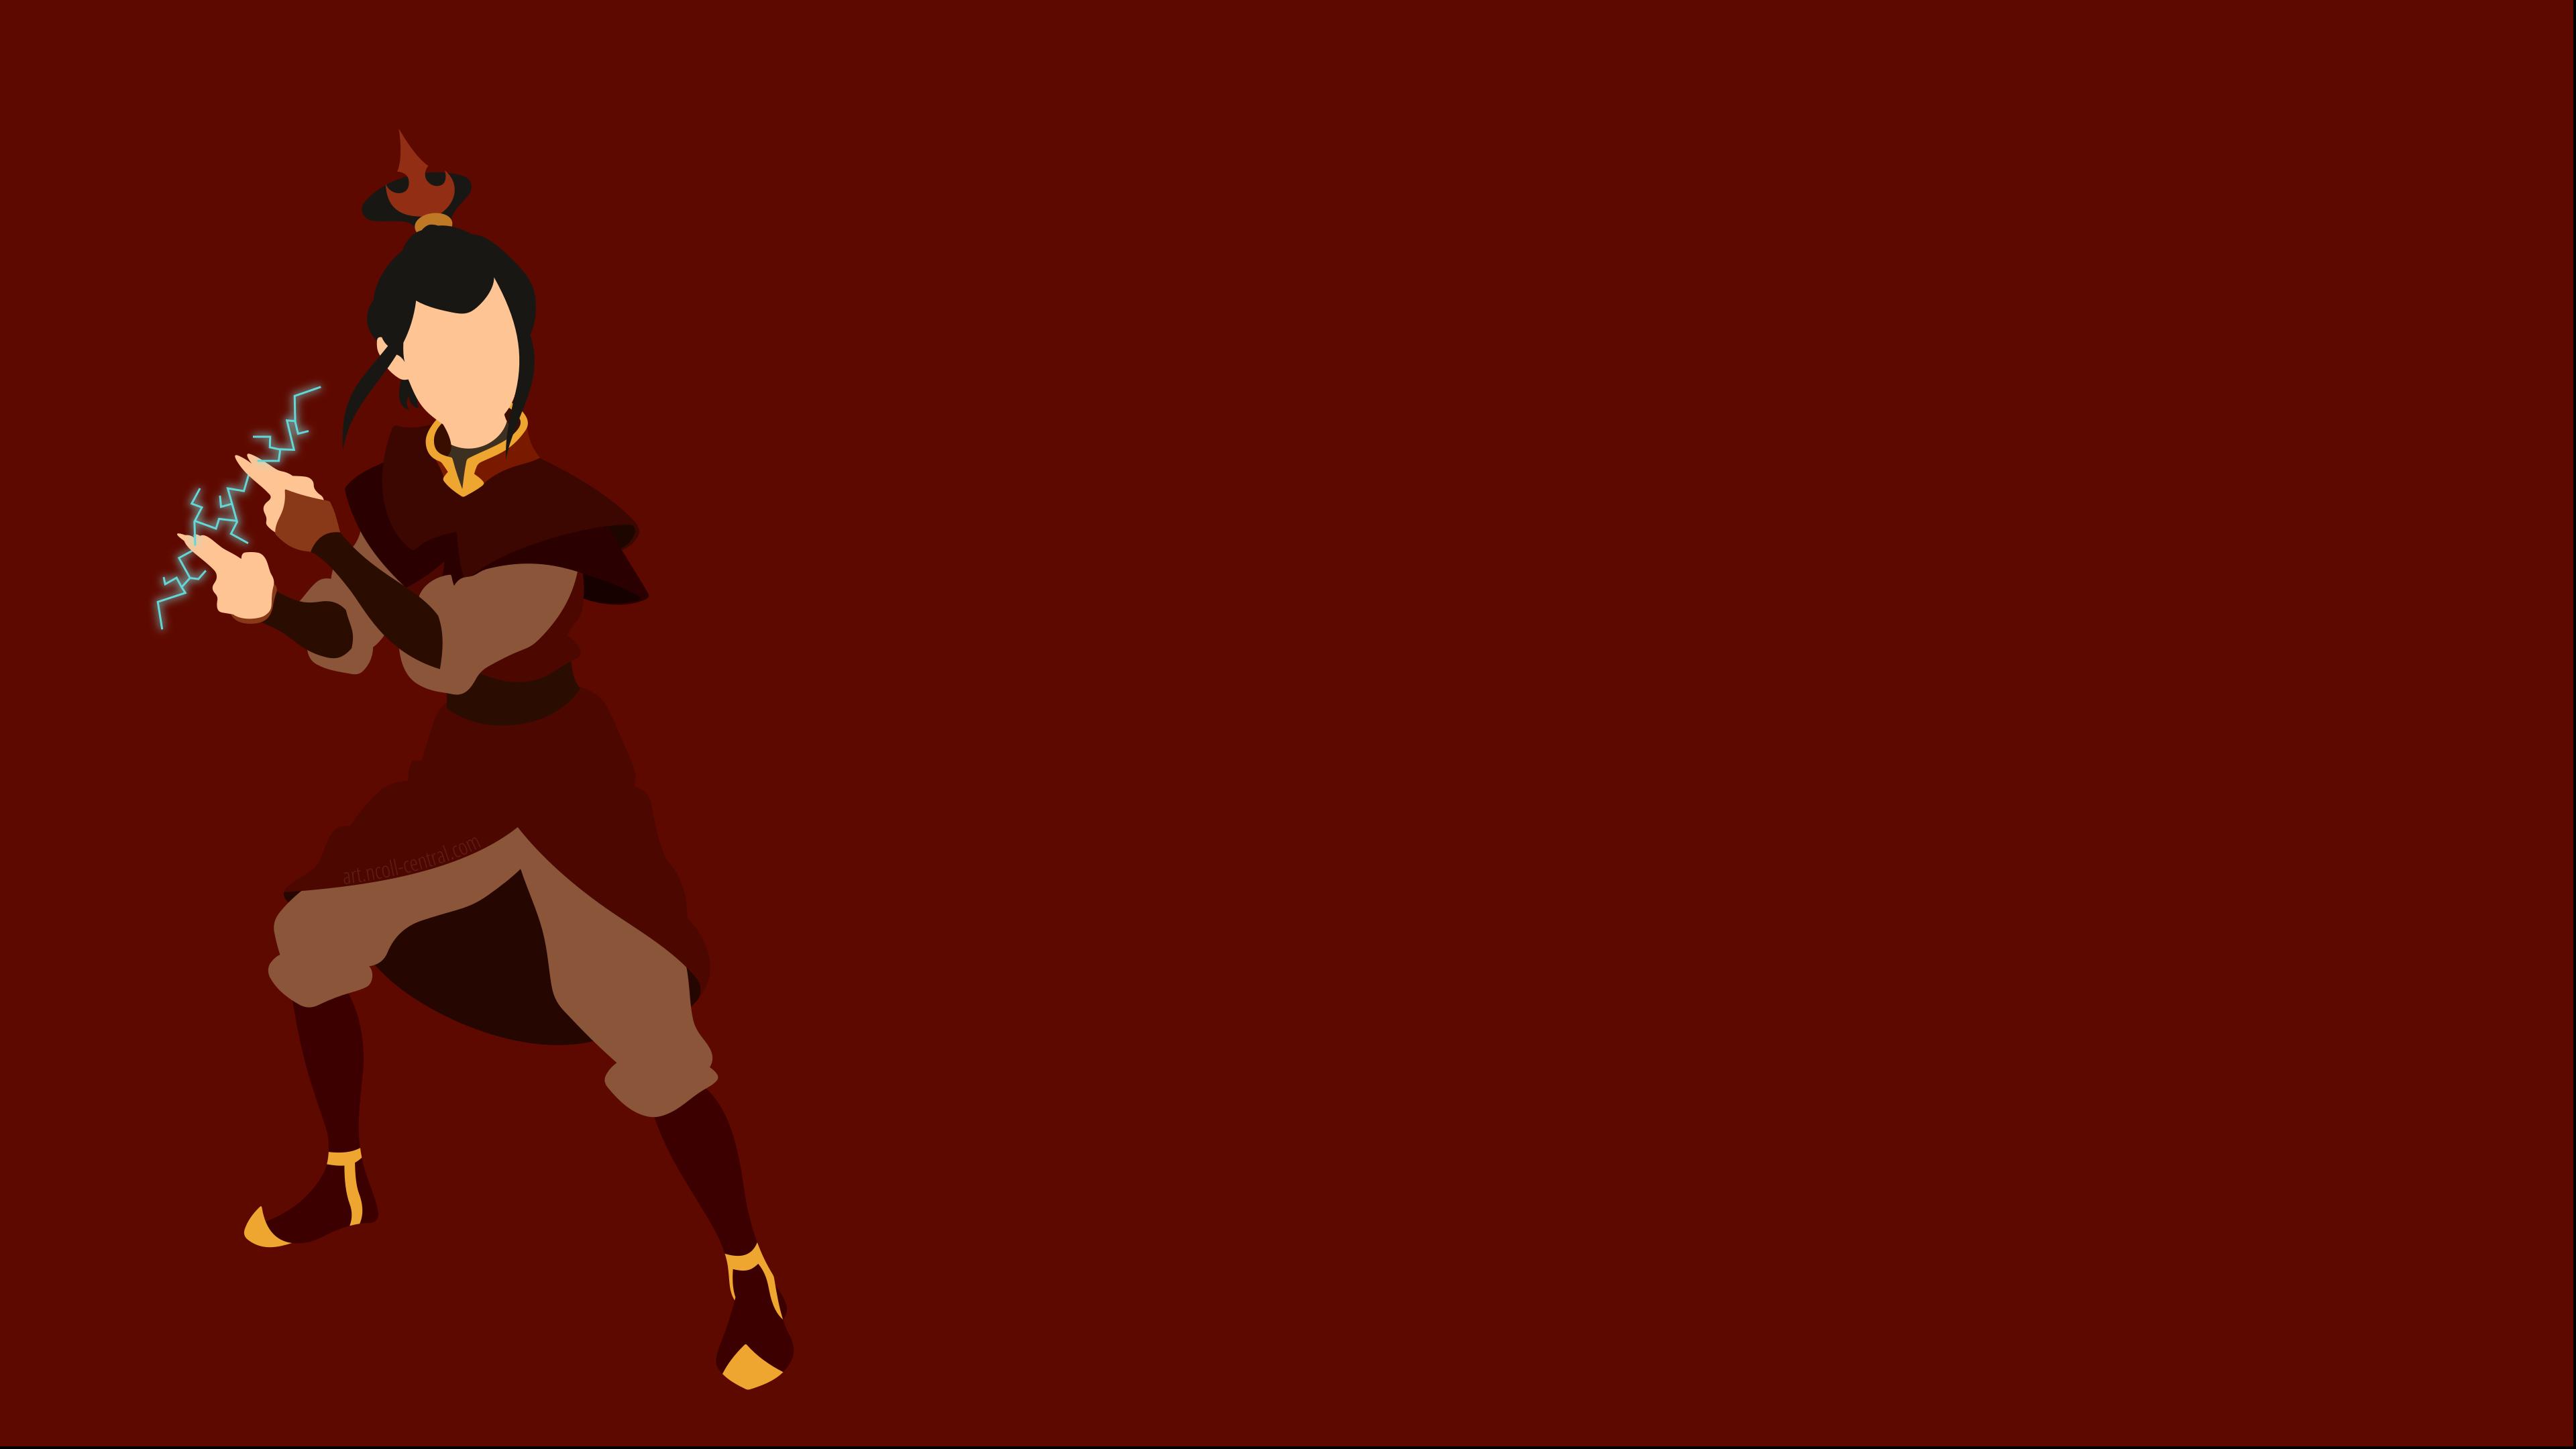 Avatar The Last Airbender 4k Ultra Hd Wallpaper Background